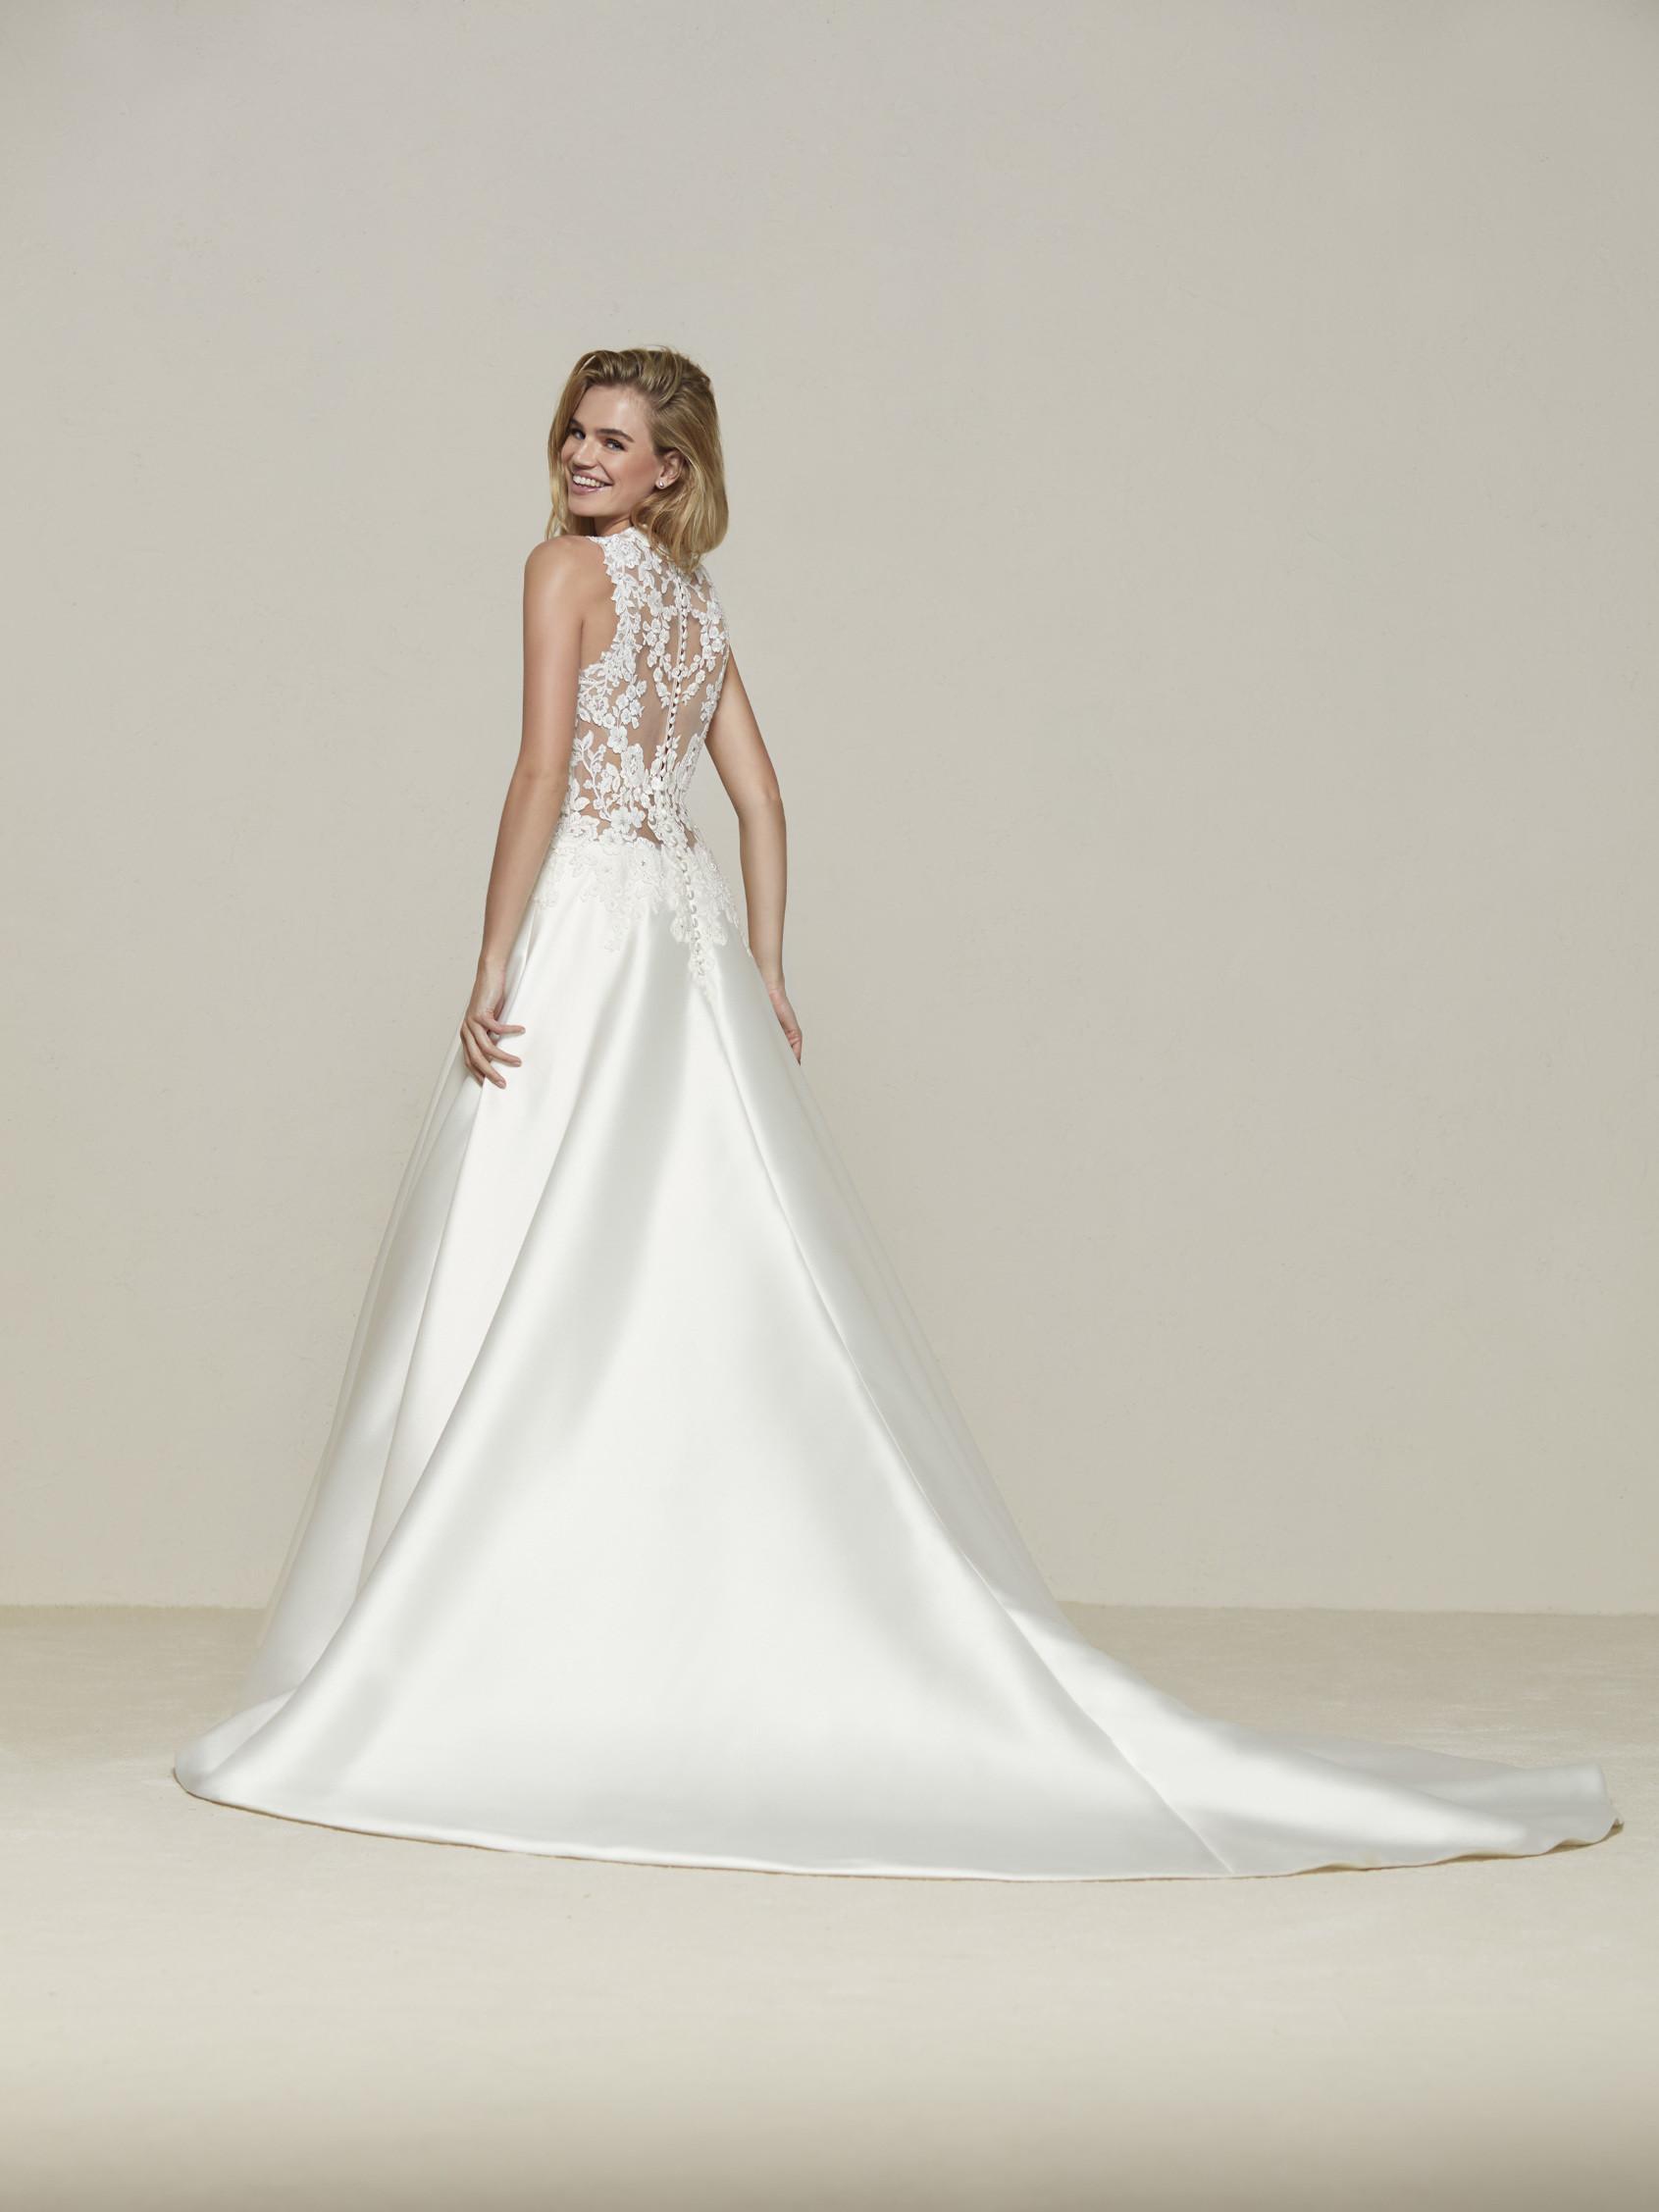 spanish wedding dresses designer photo - 1